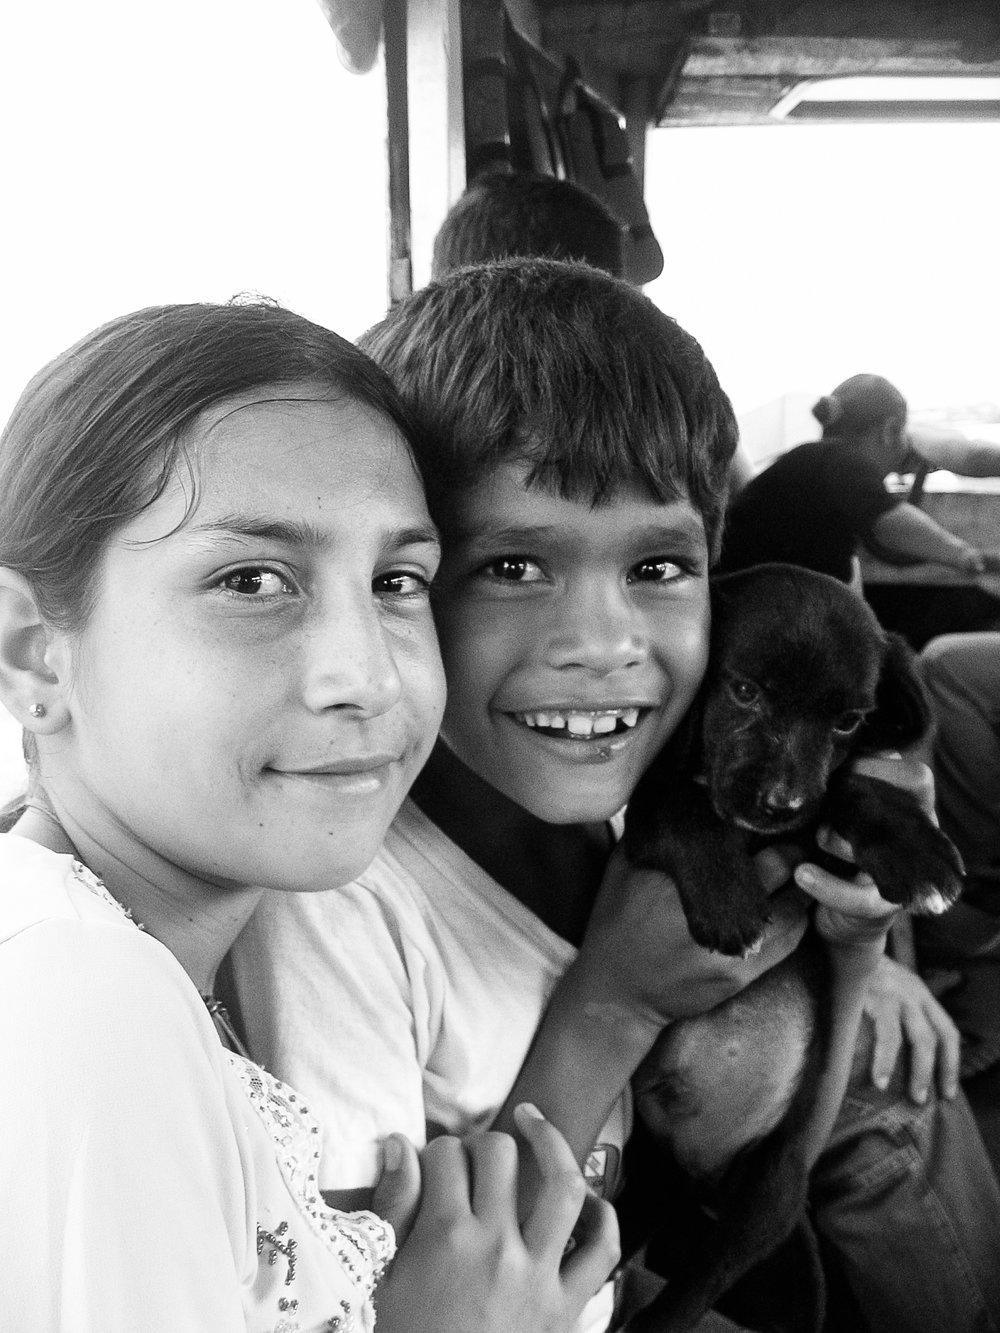 asuncion-7434-boy-and-girl-with-dog-on-boat.jpg